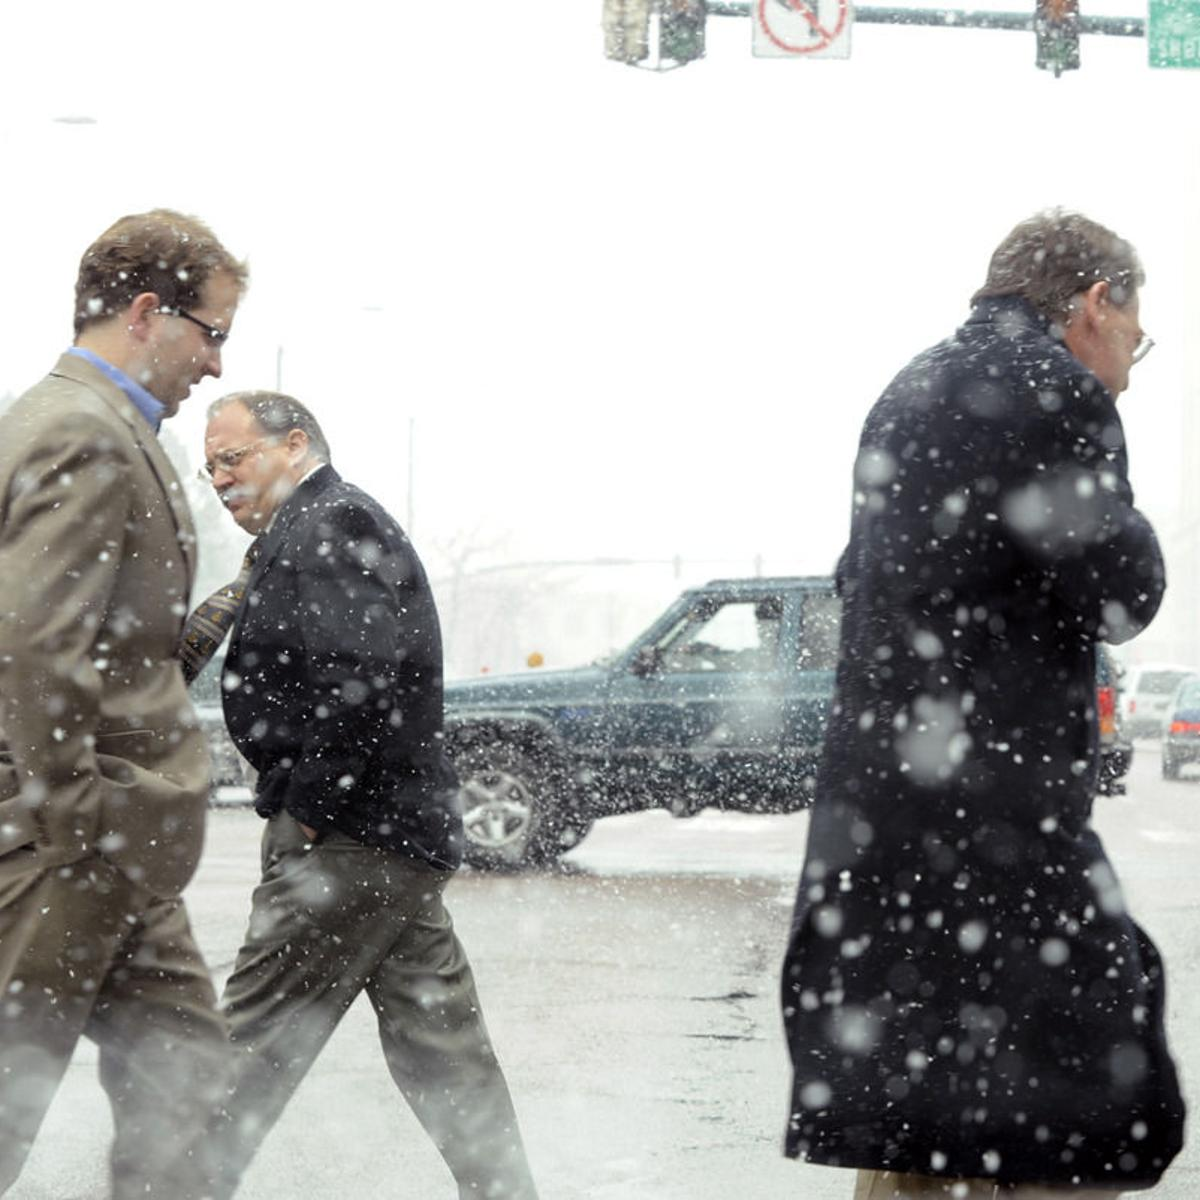 Forecast: Light snow showers to continue in Colorado Springs